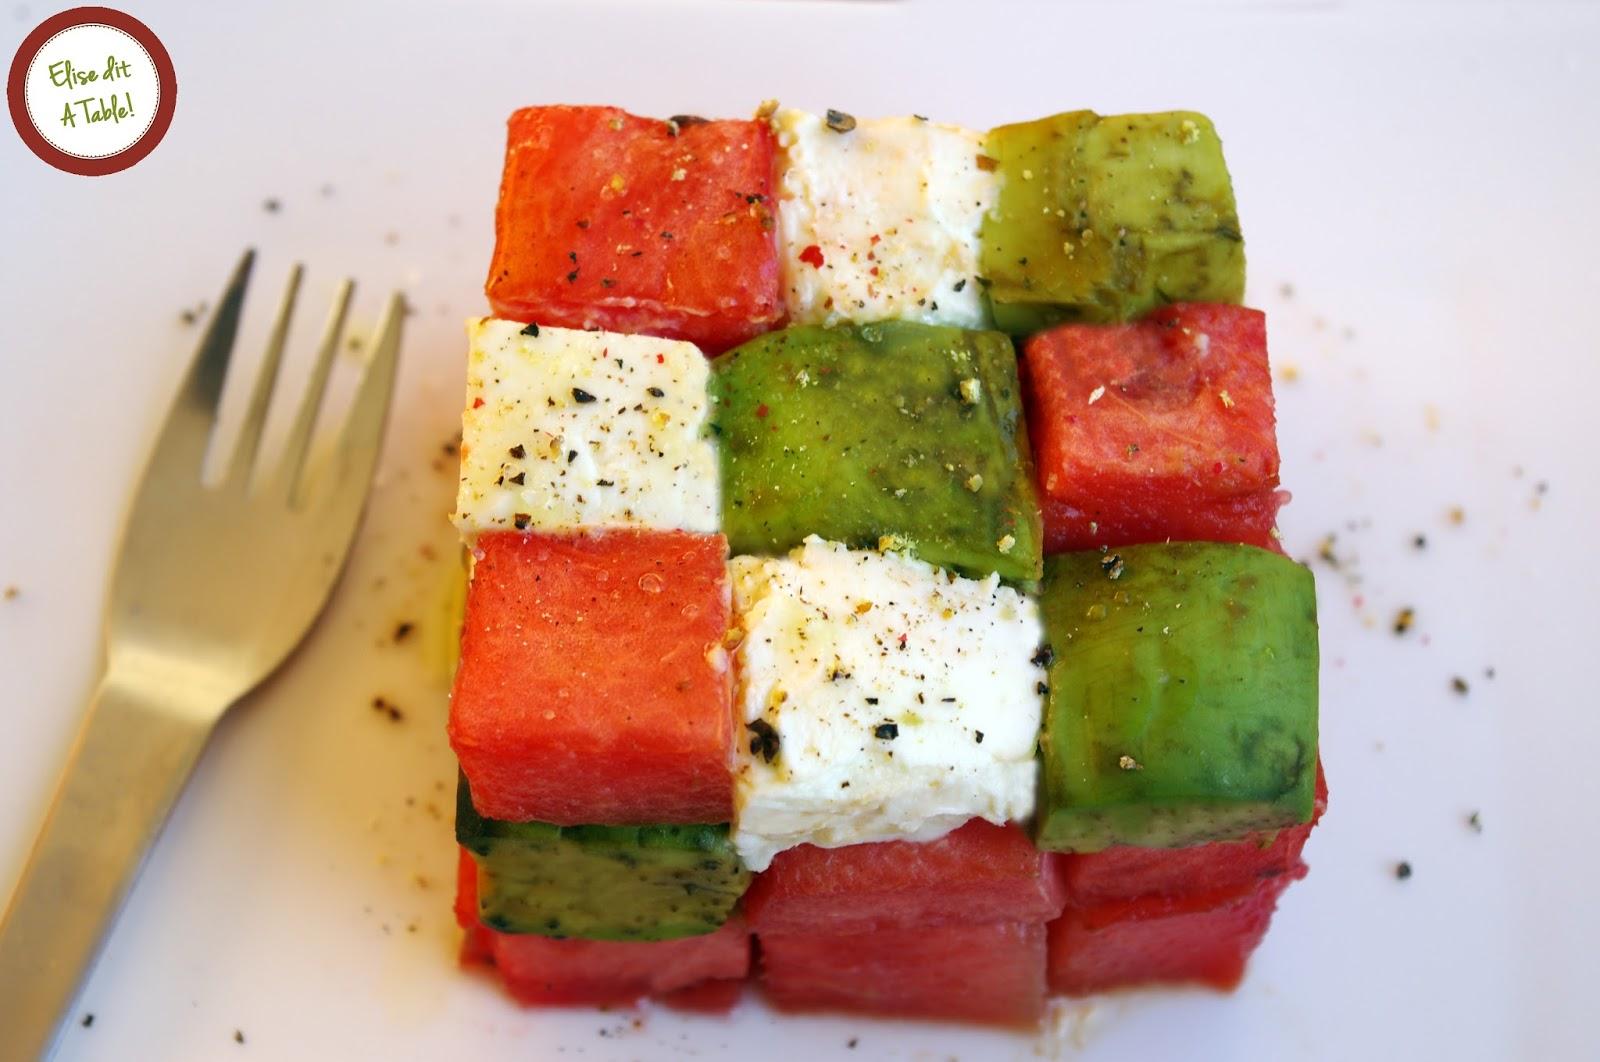 recette salade rubik's cube